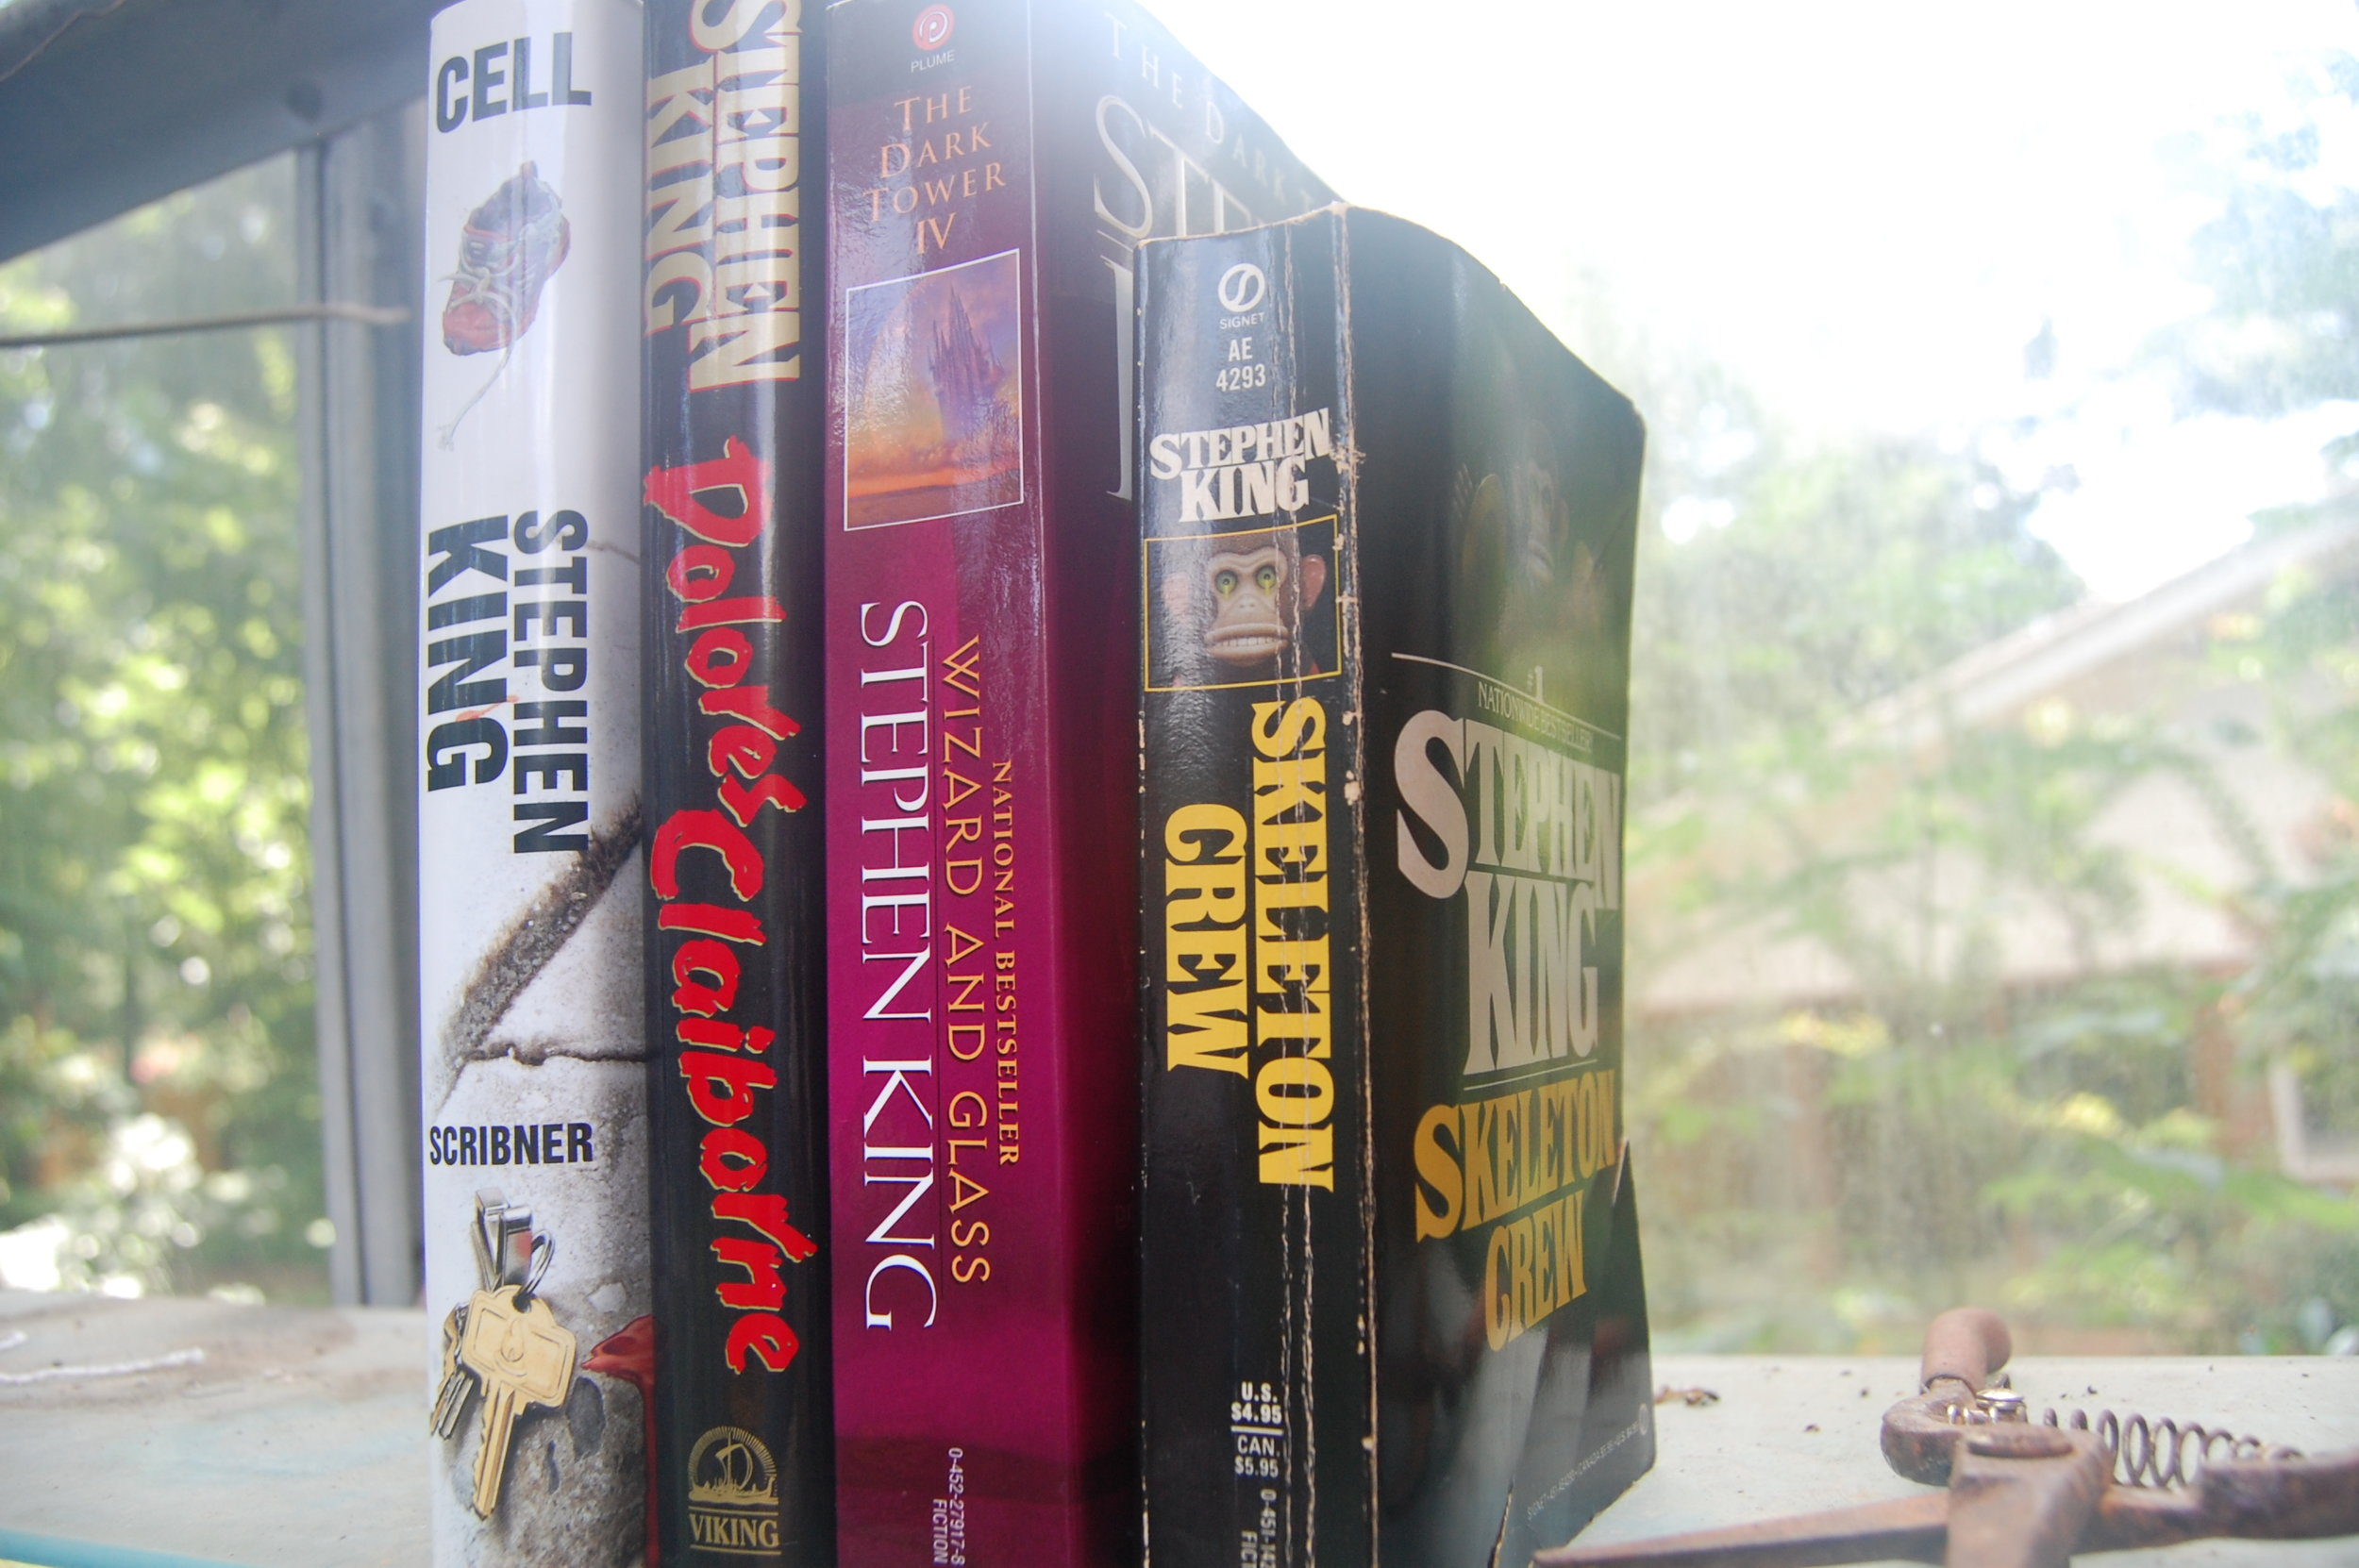 Stephen King Book Shelfie Vertical